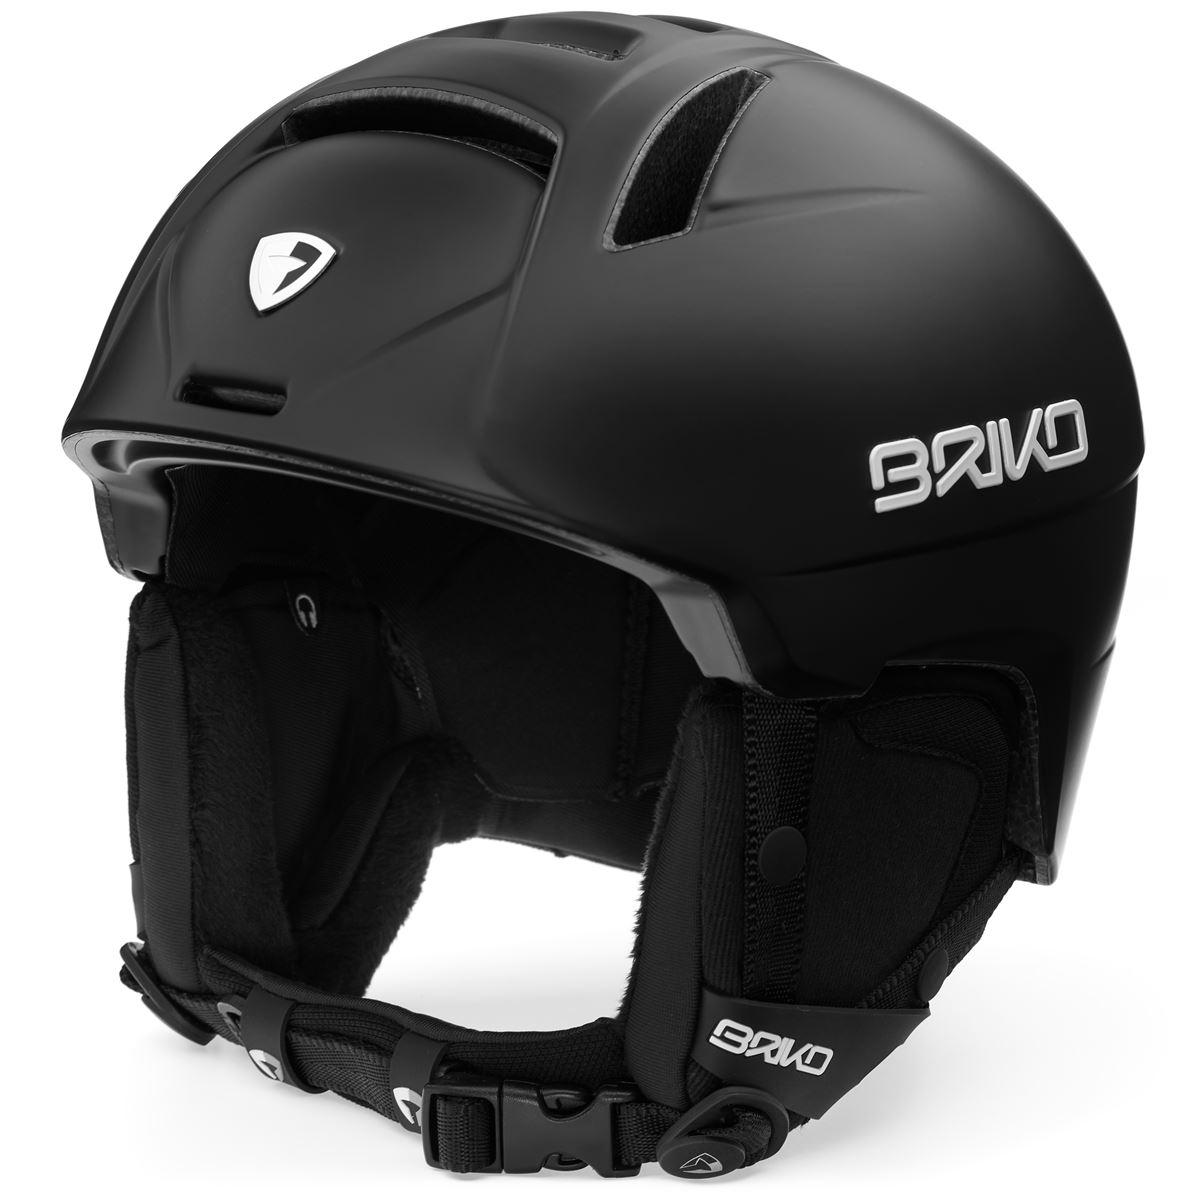 Snowboard Helmet -  briko CANYON